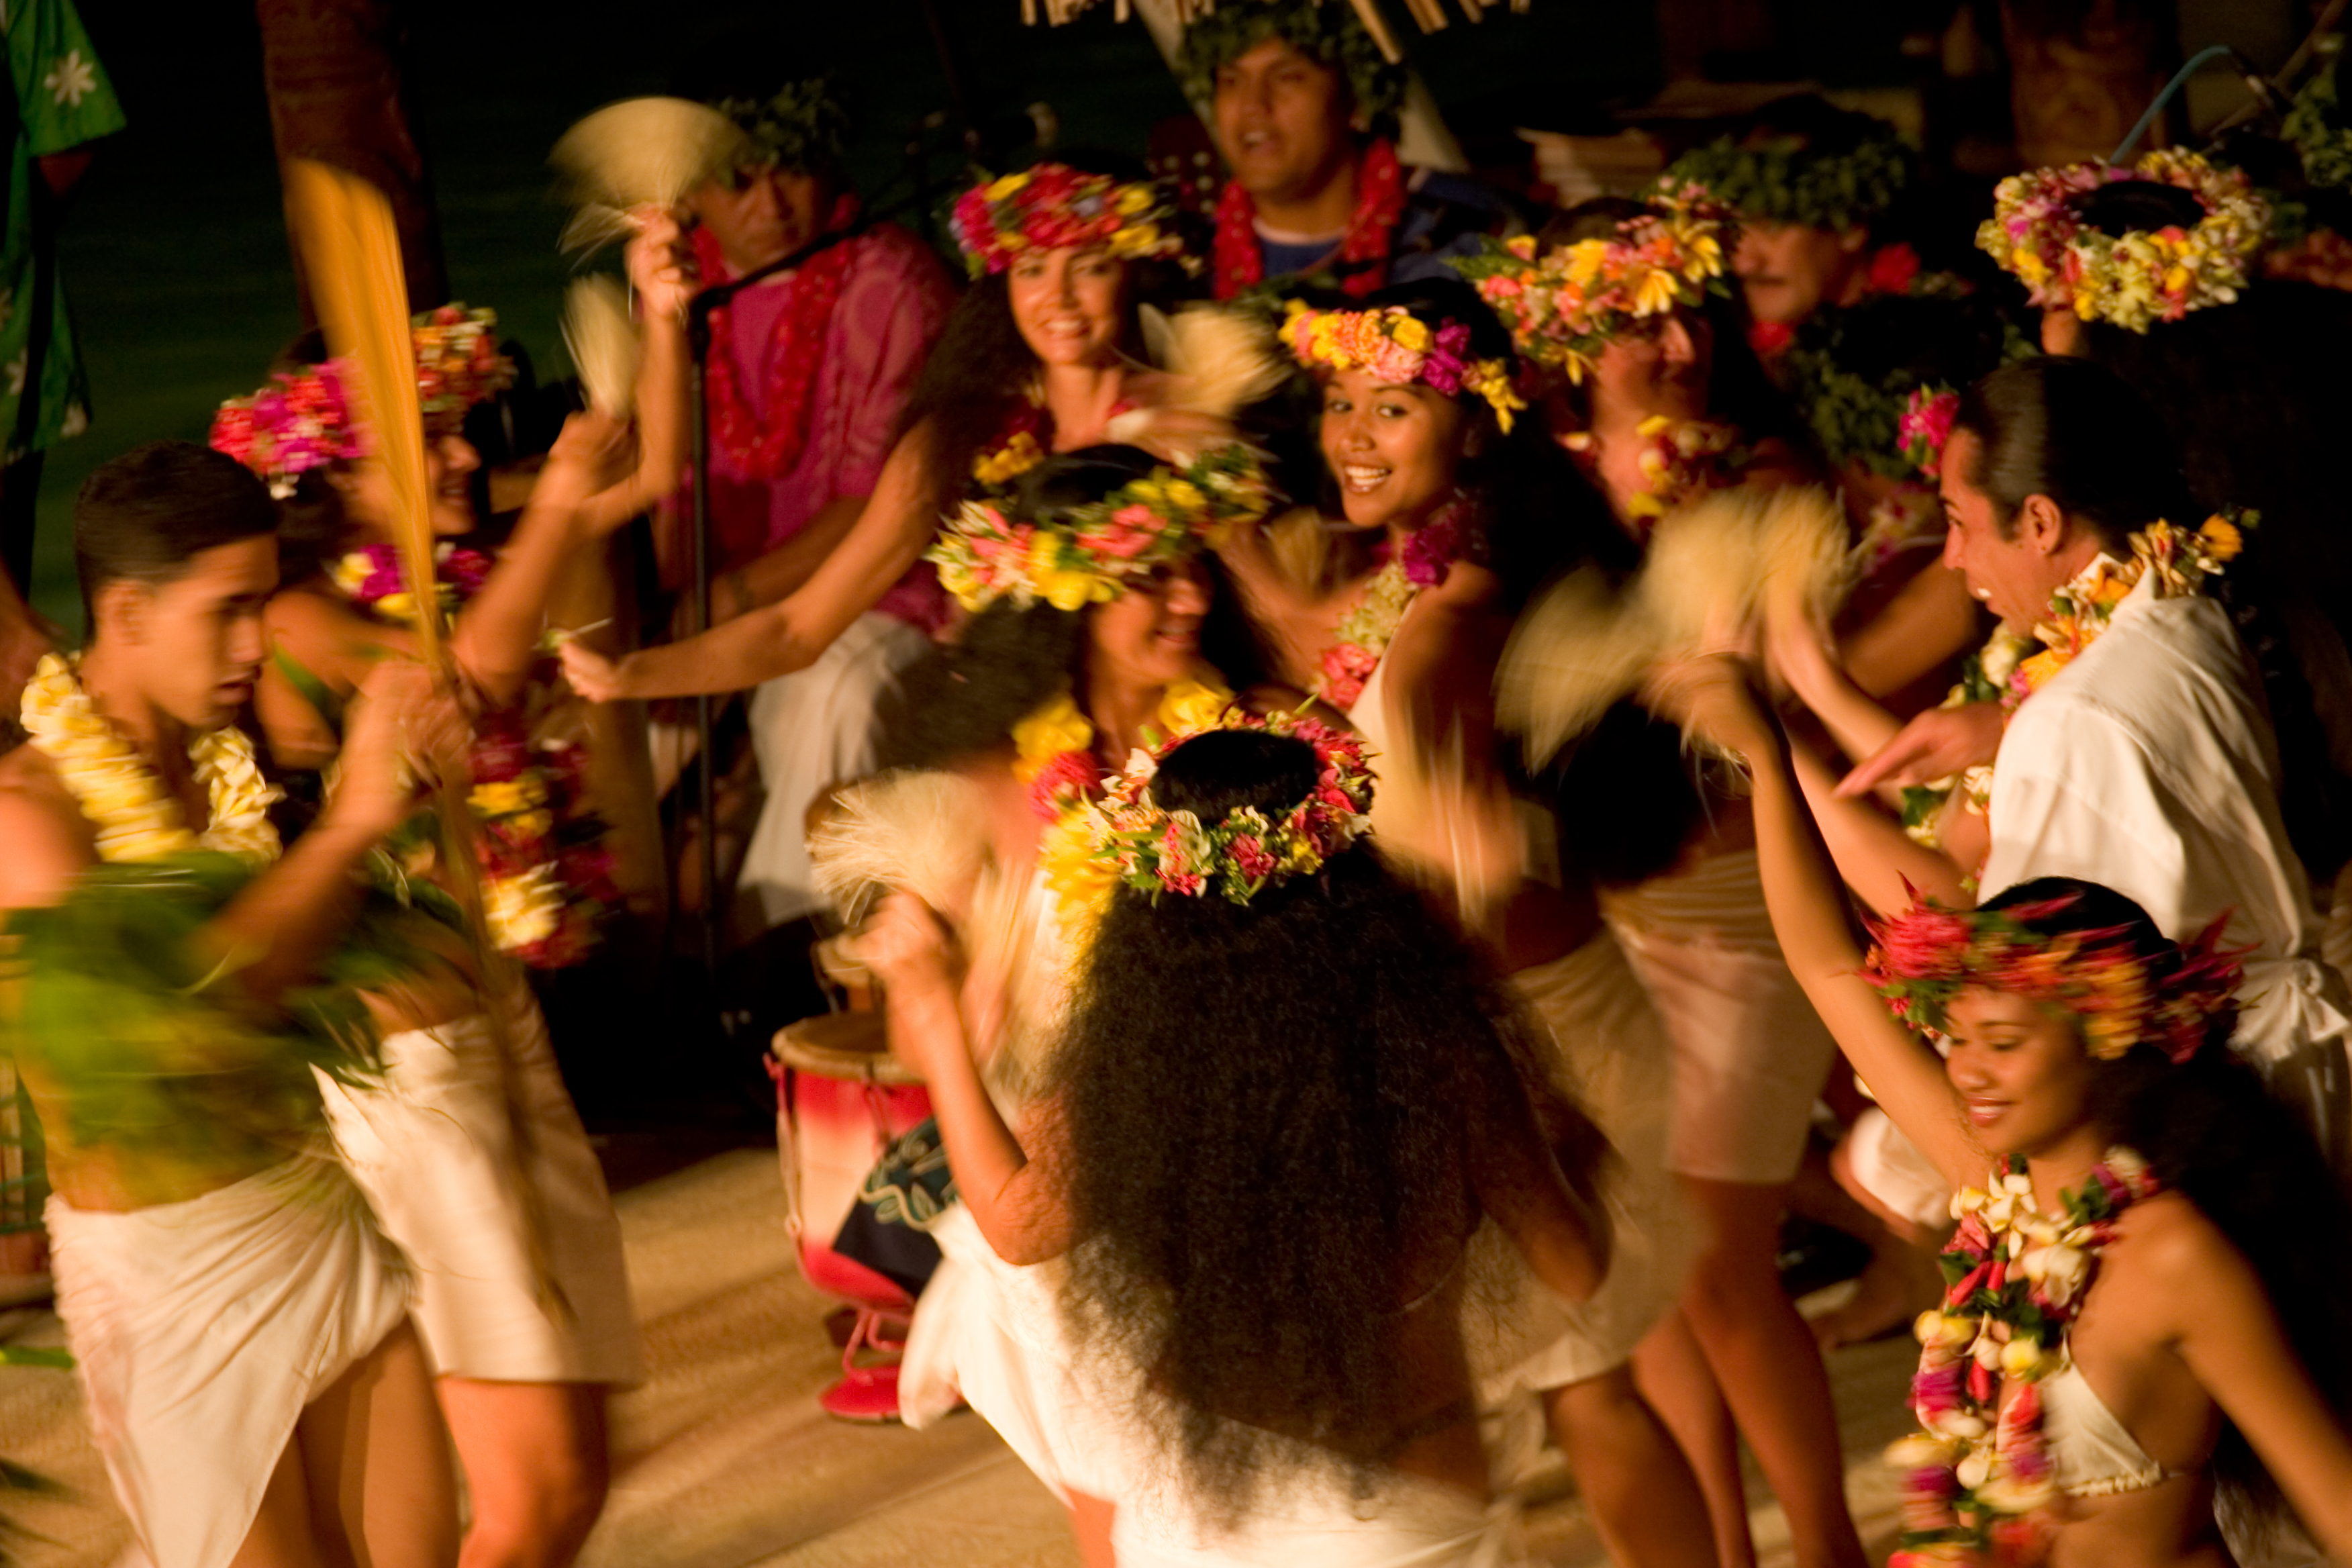 Traditional Polynesian dancing